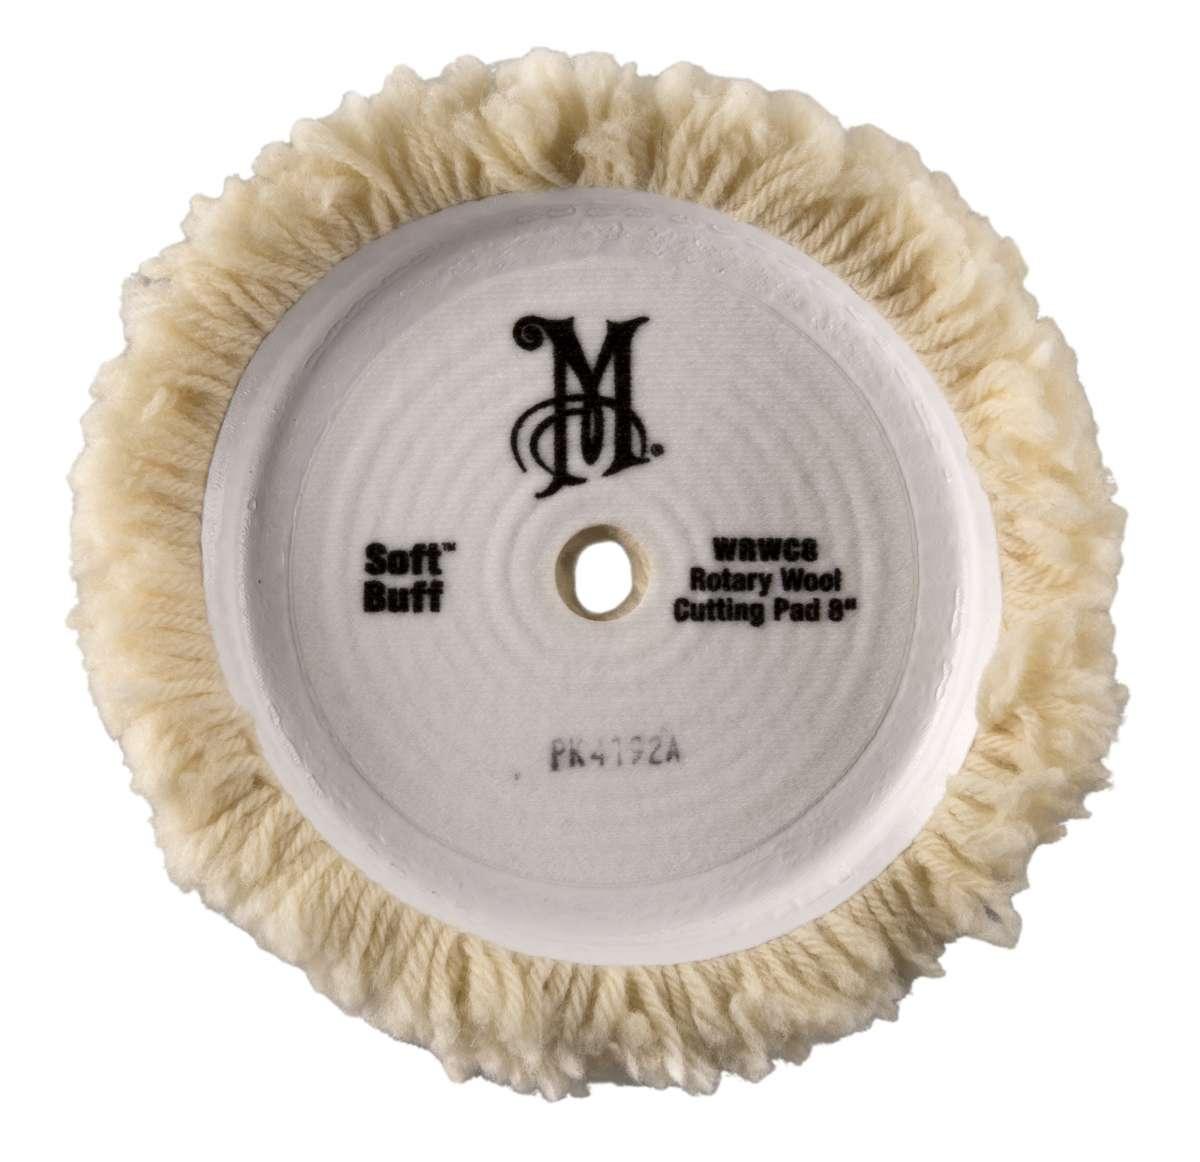 Meguiar's Soft Buff Rotary Wool Cutting Pad